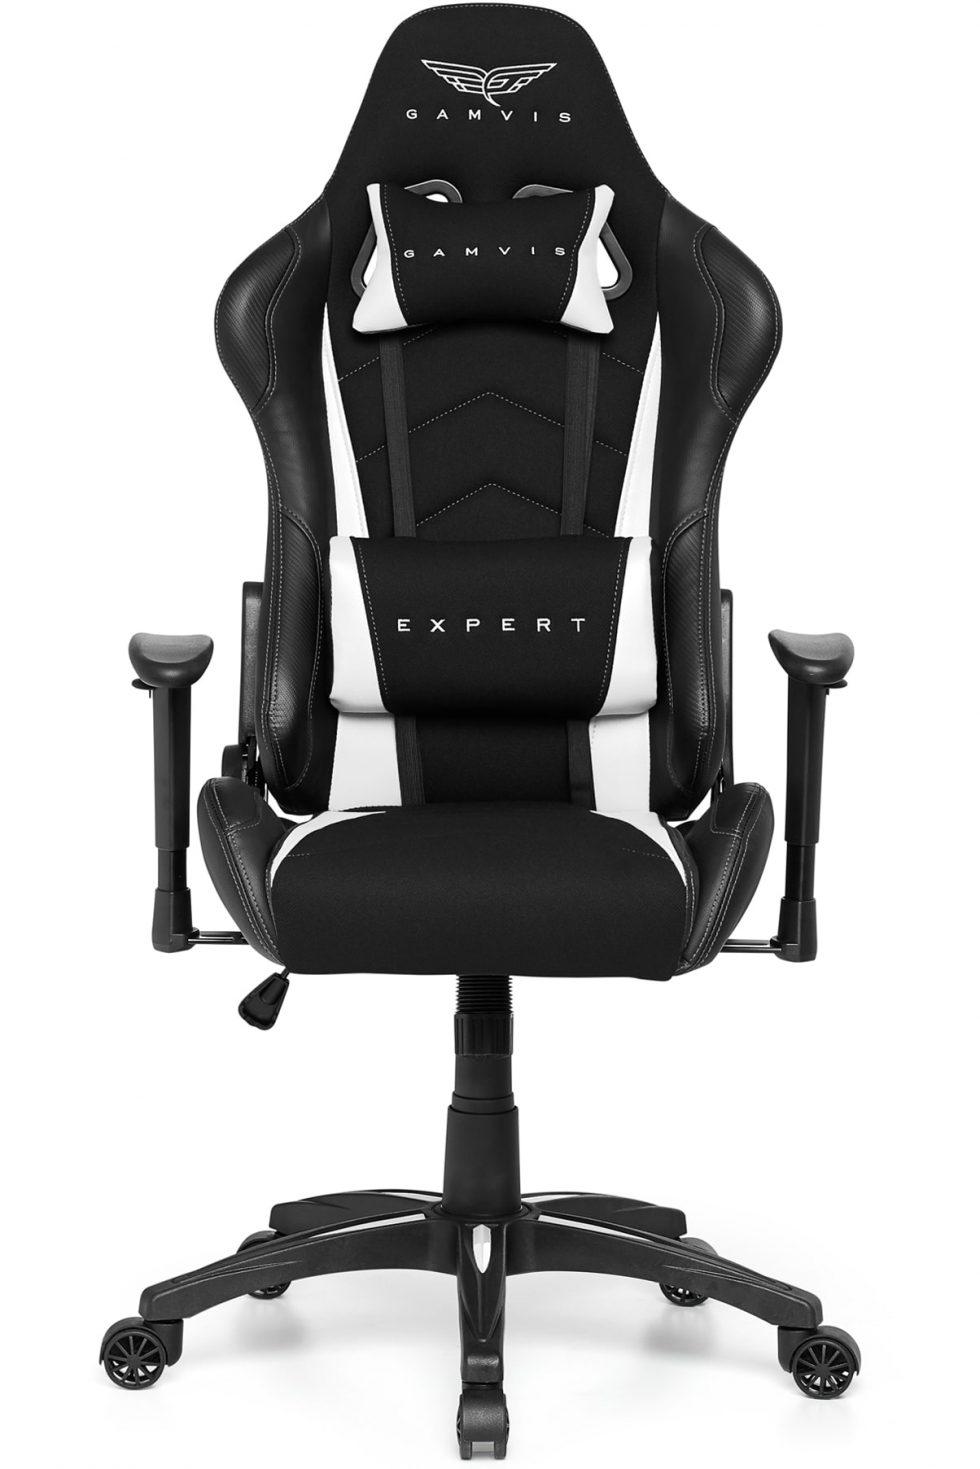 Gamvis EXPERT Fabric Gaming Chair - Black/White